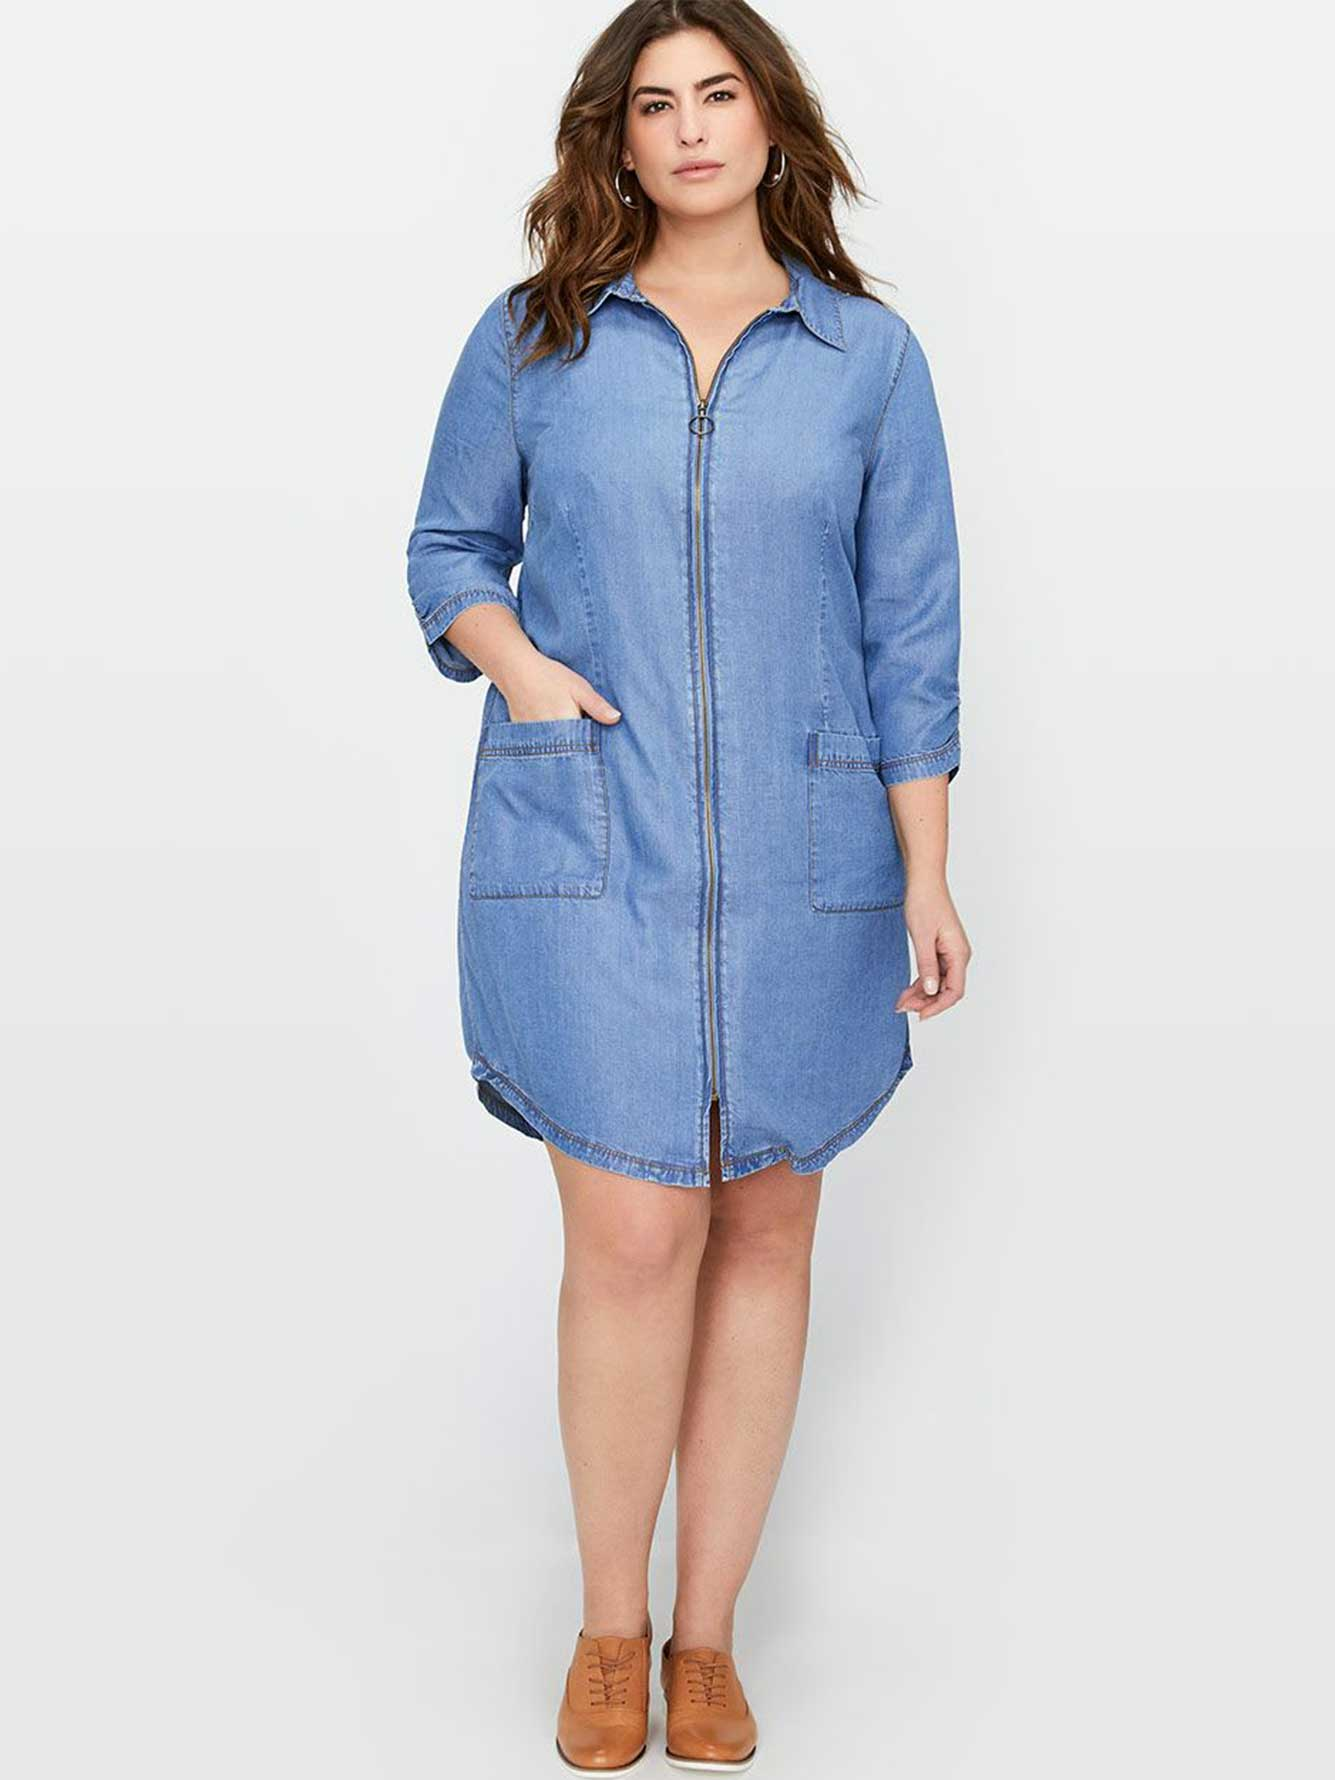 L&L Denim Shirt Dress with Zip | Addition Elle